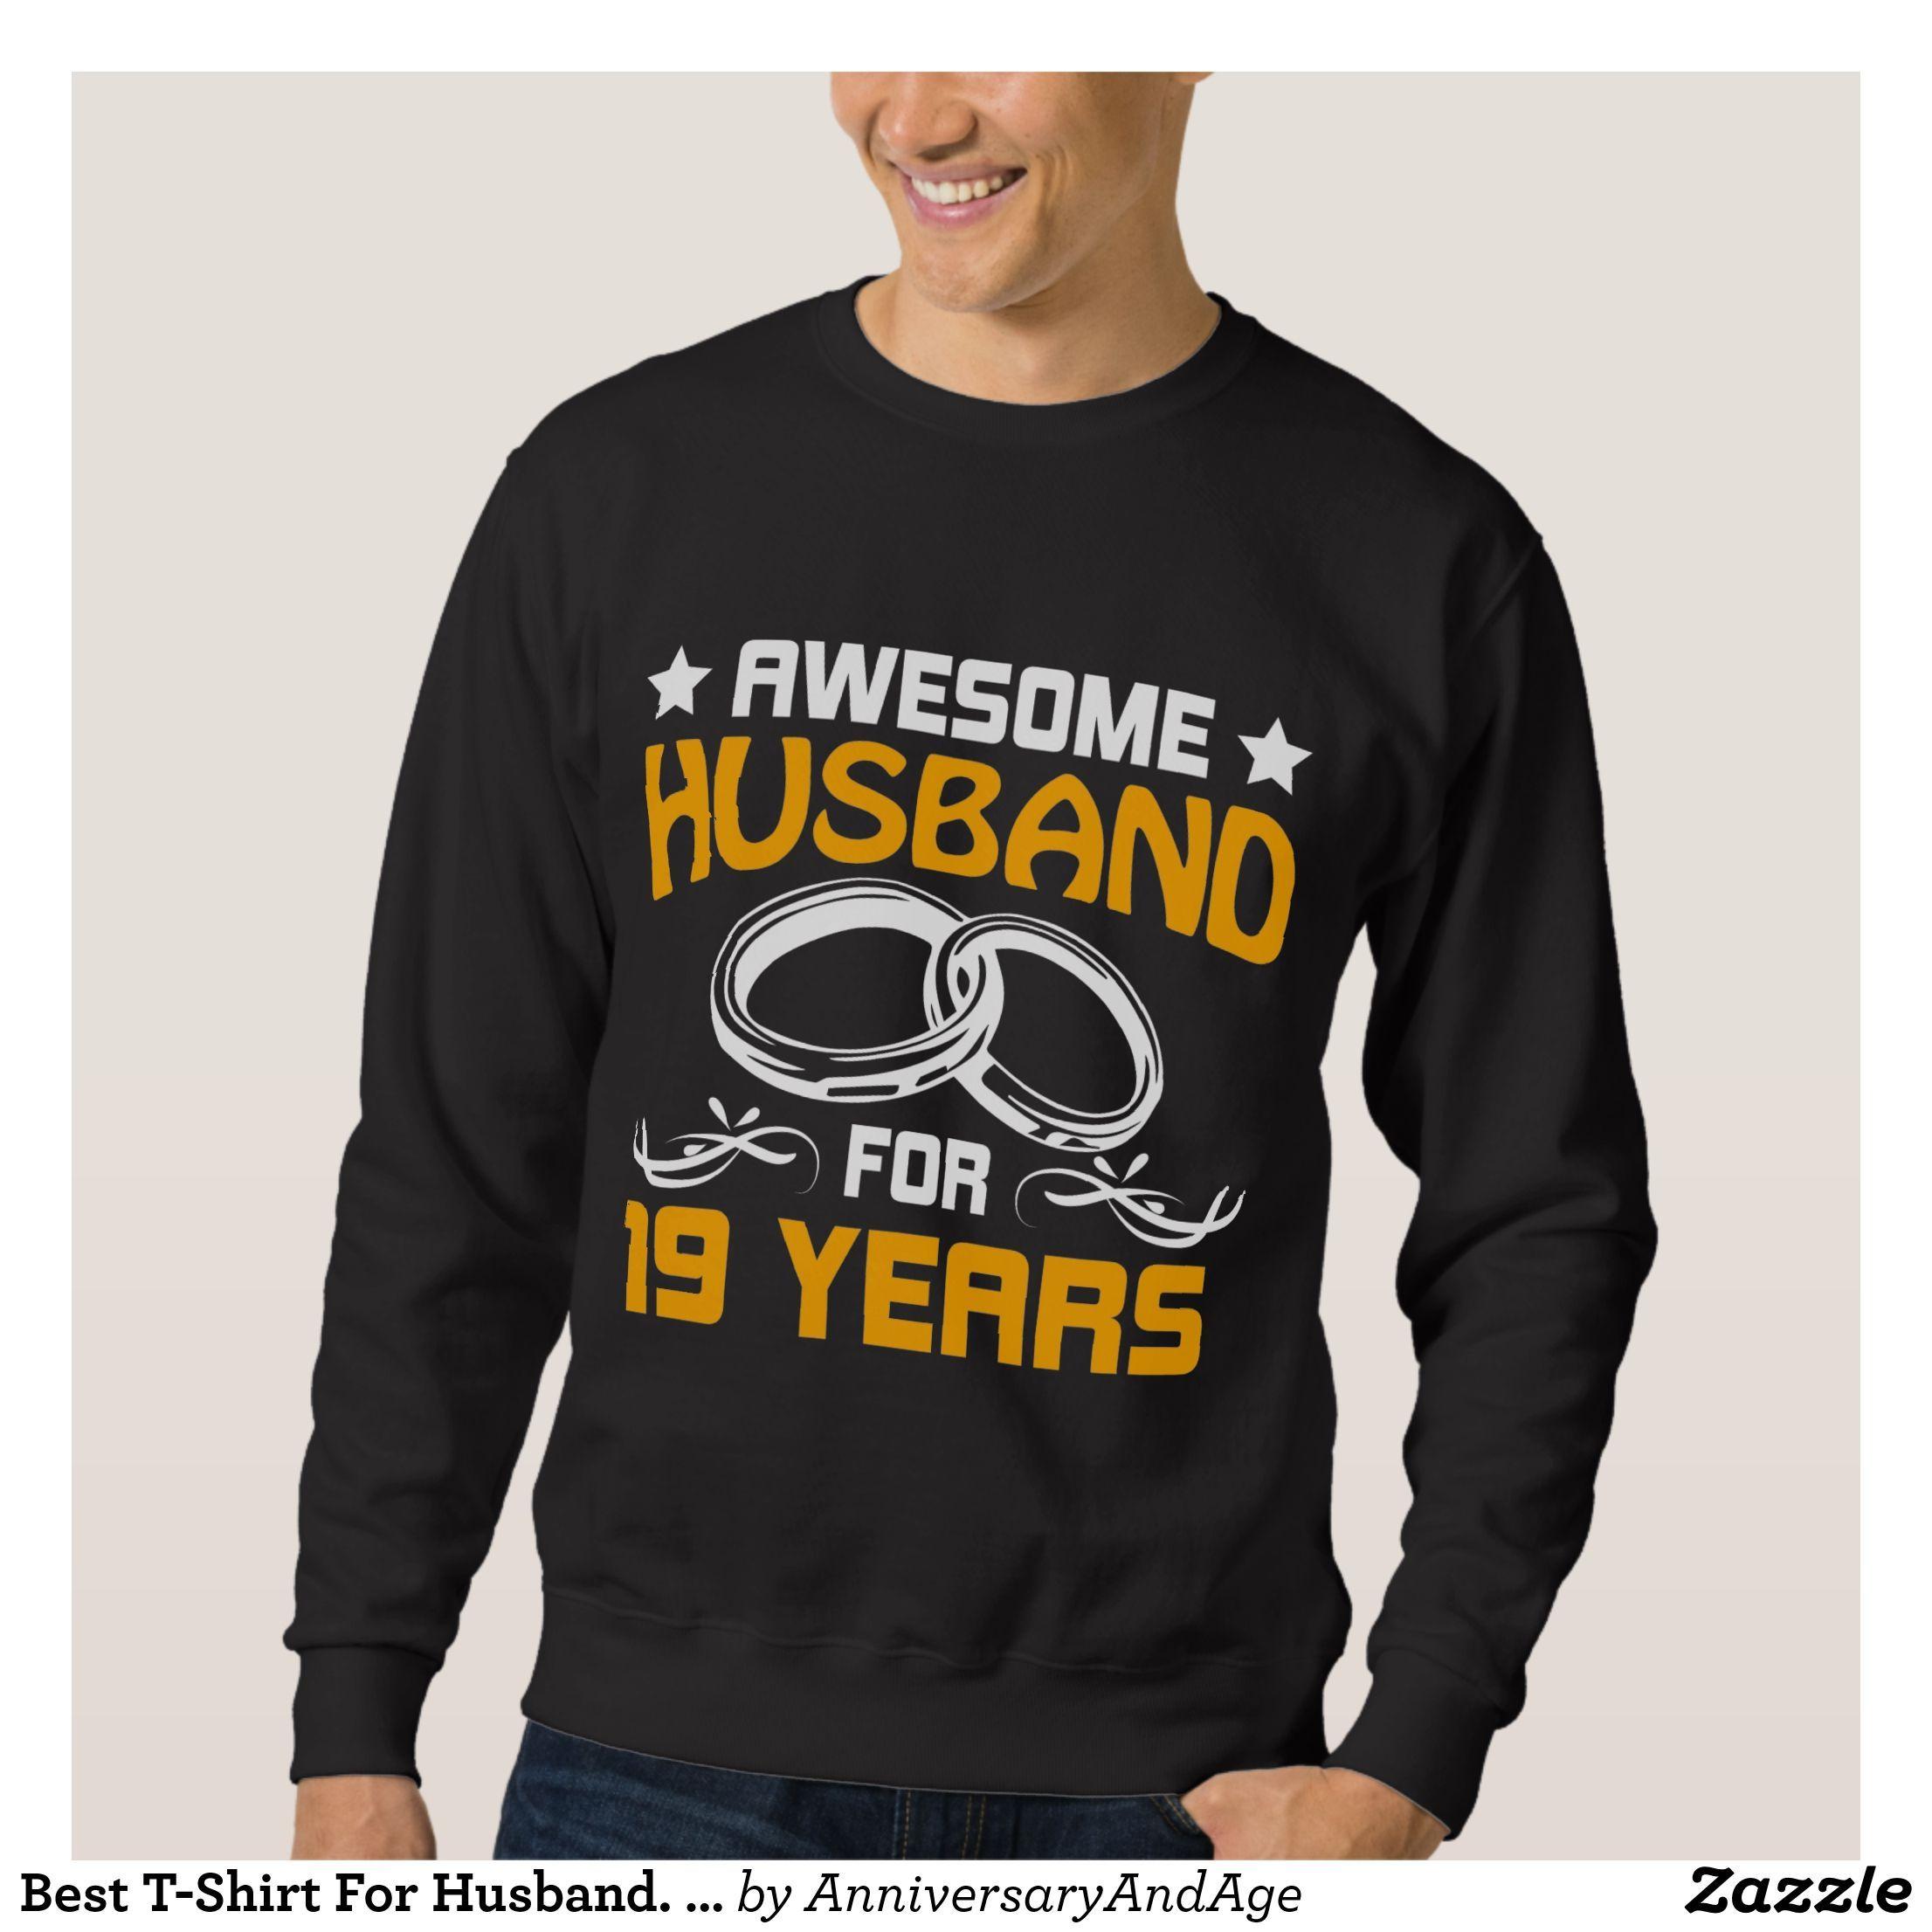 Best TShirt For Husband. 19th Anniversary Gift. Zazzle